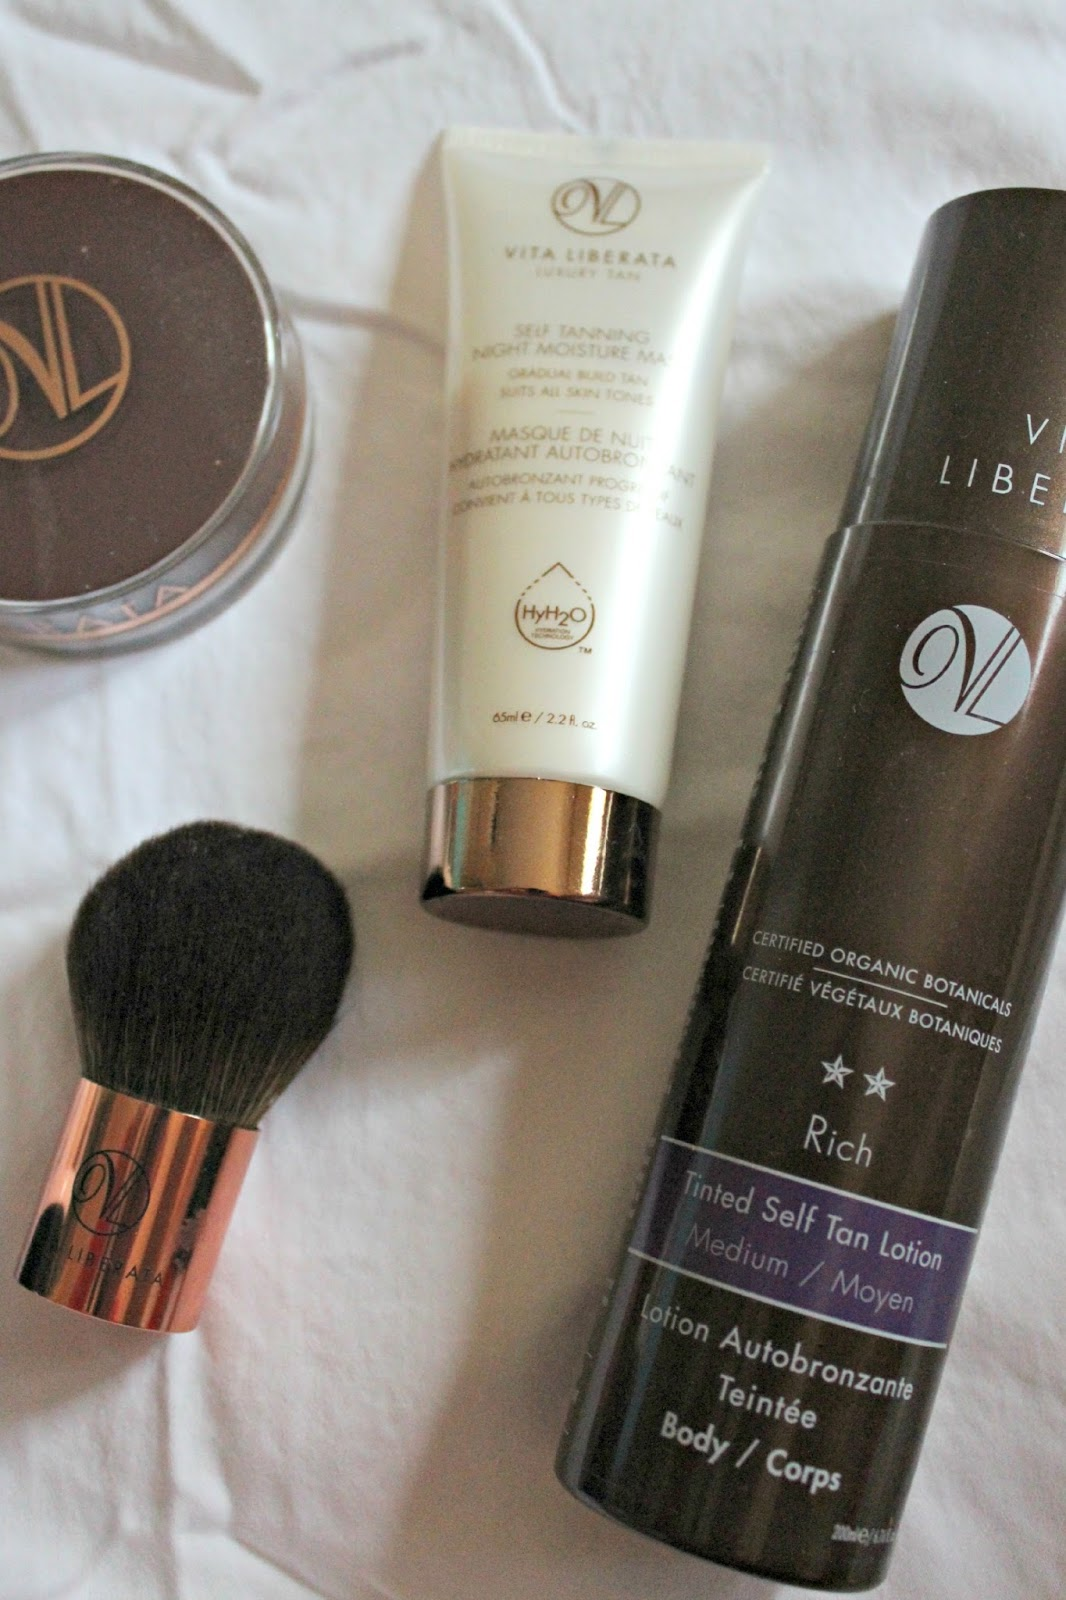 vita liberata rich tinted self tan lotion